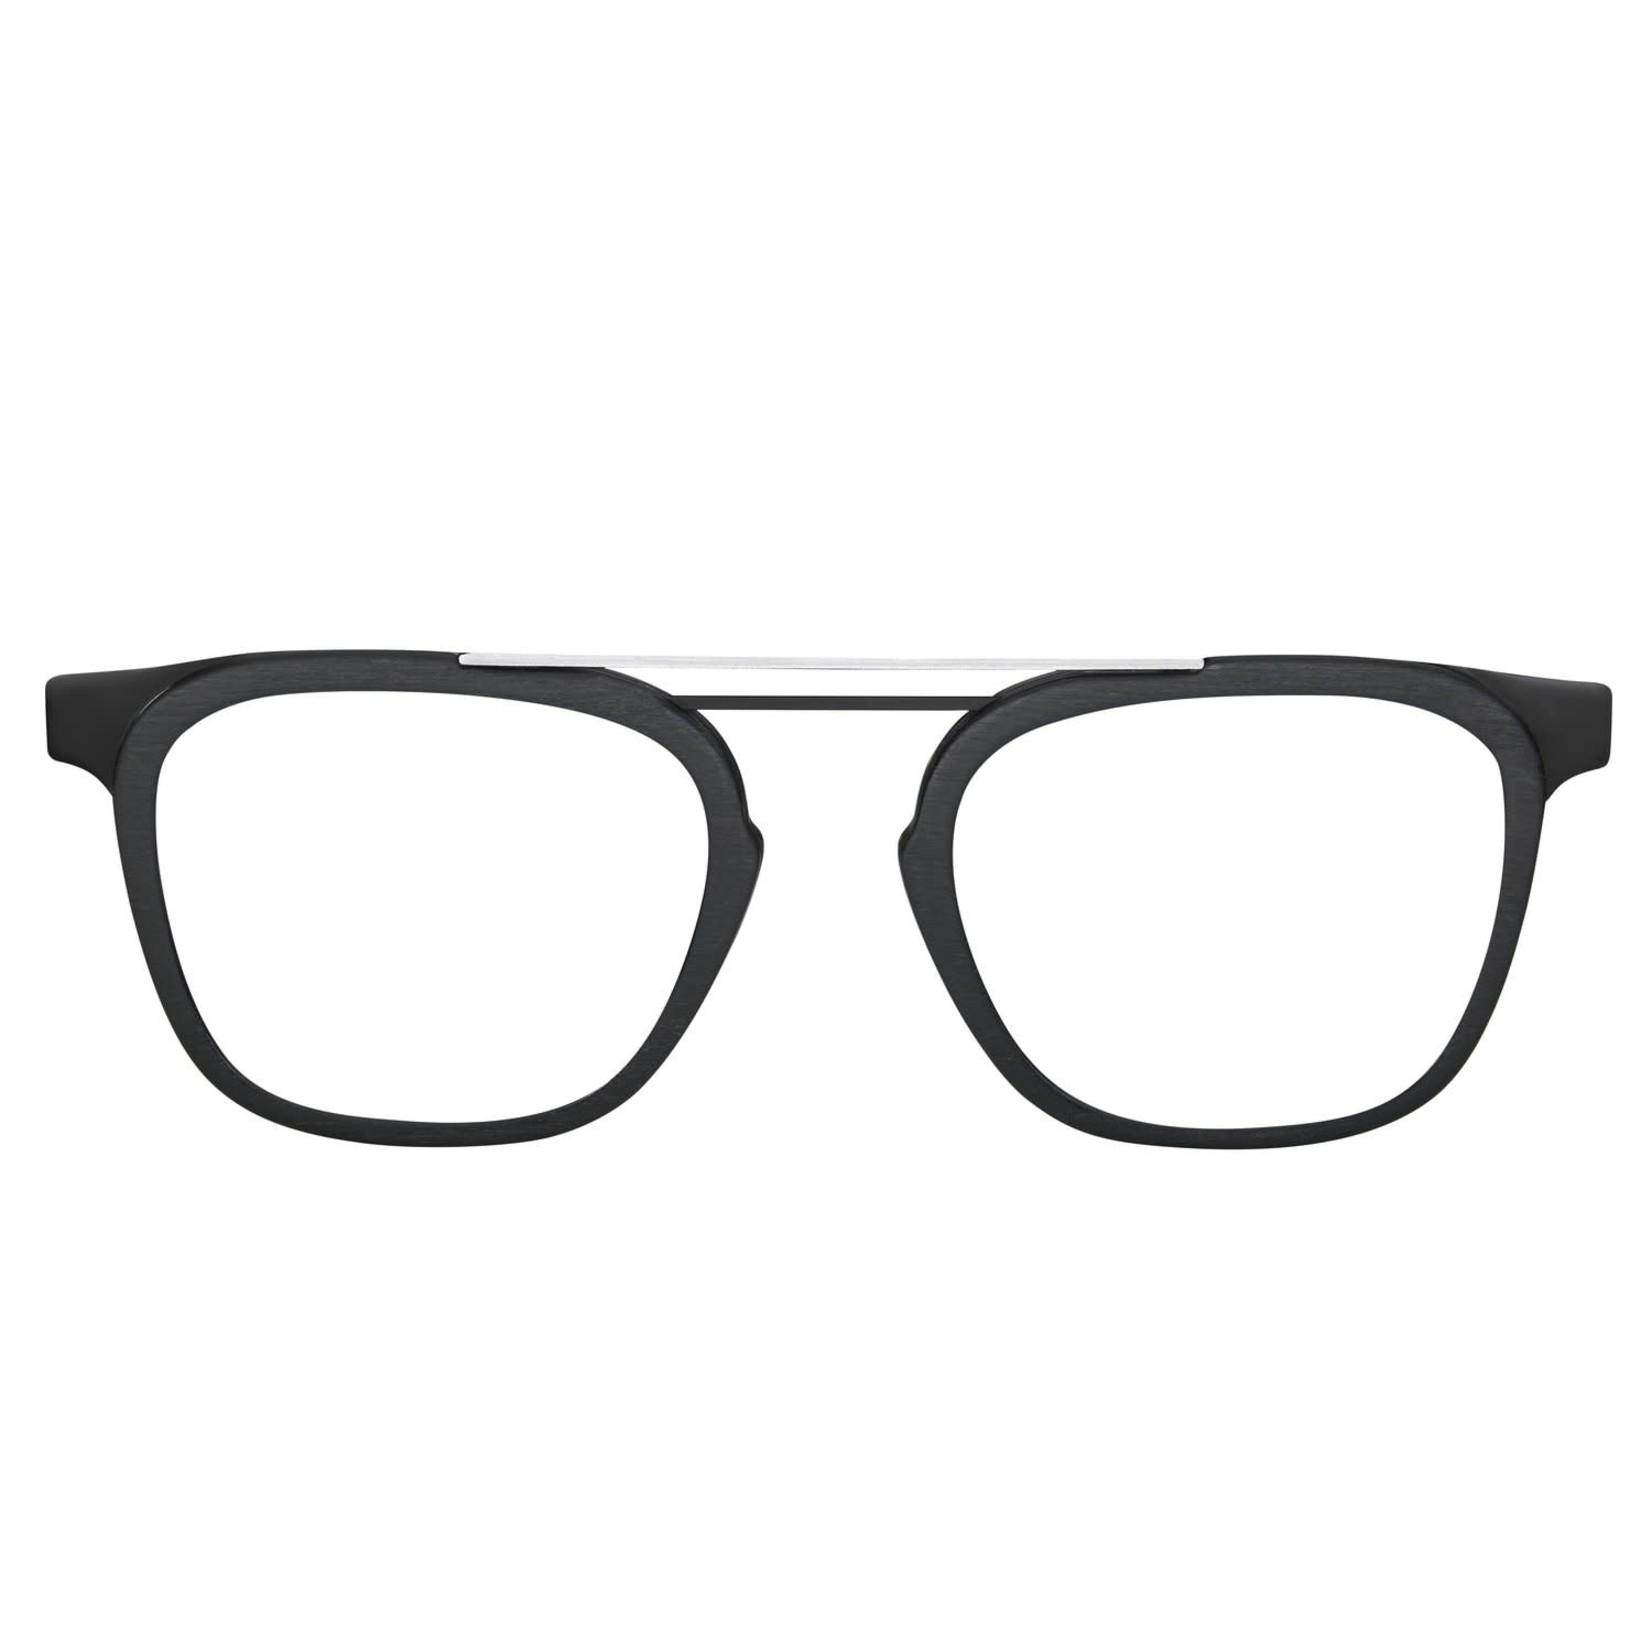 La Petite Lunette Eyewear LPLR Ediron